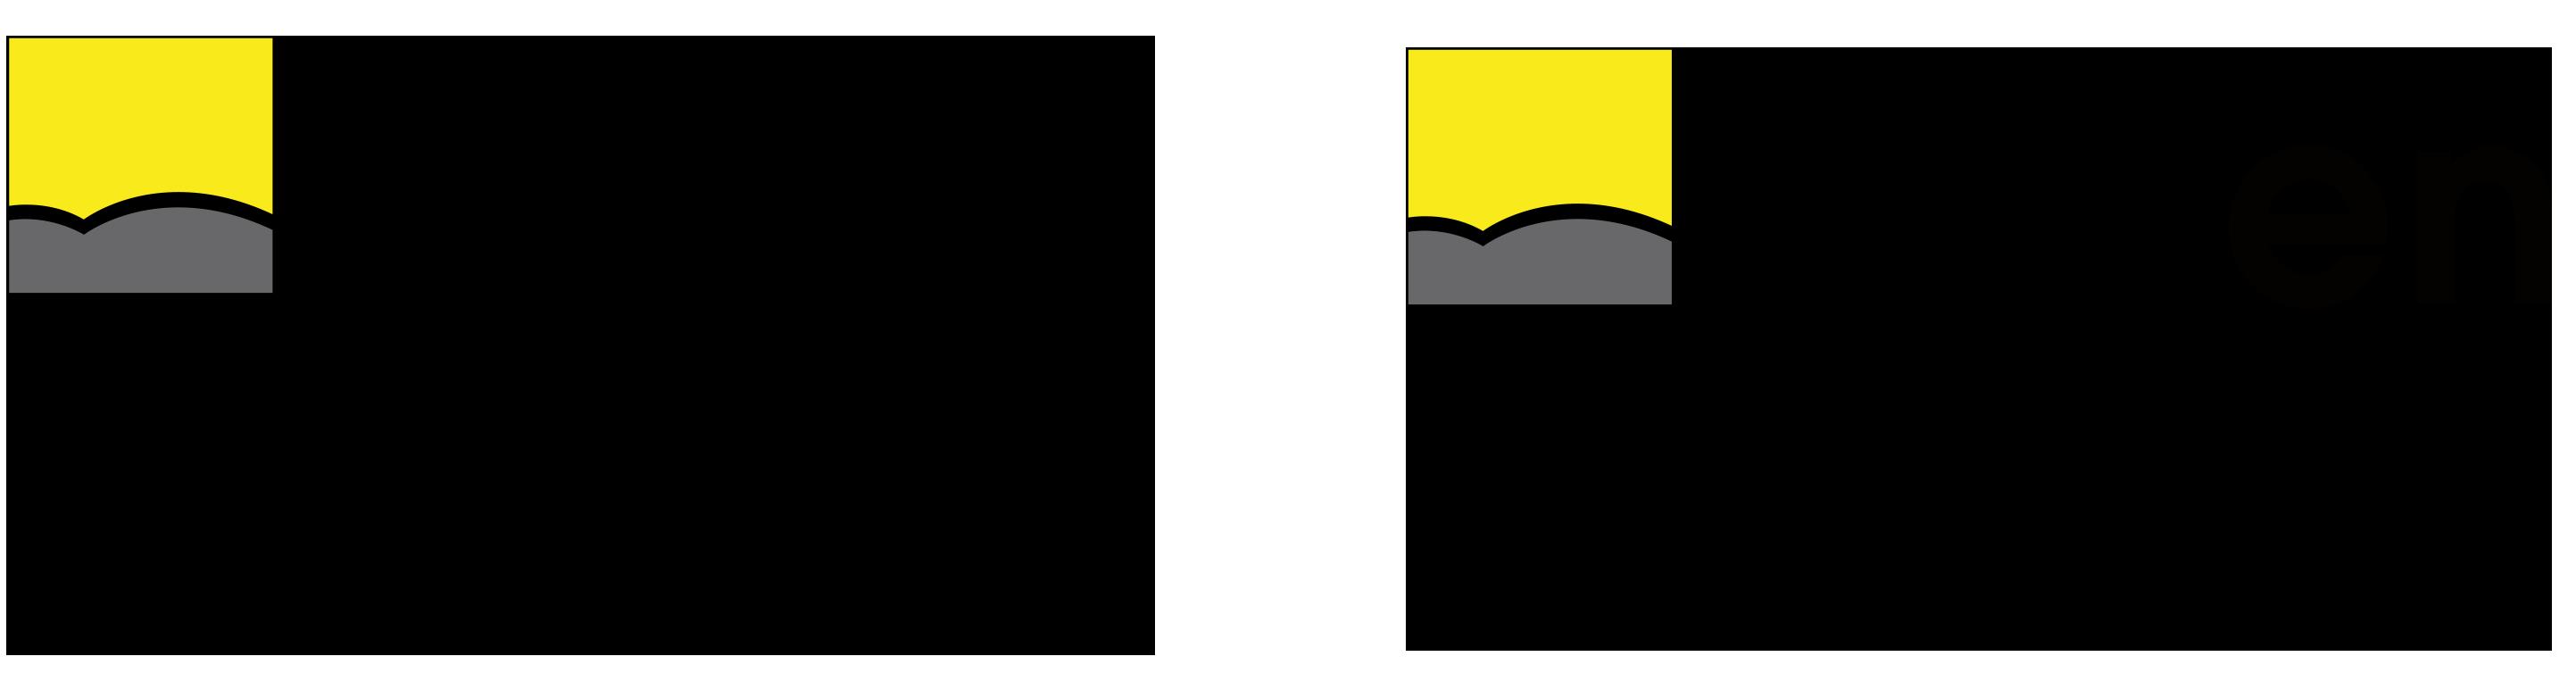 Betten Mangei GmbH